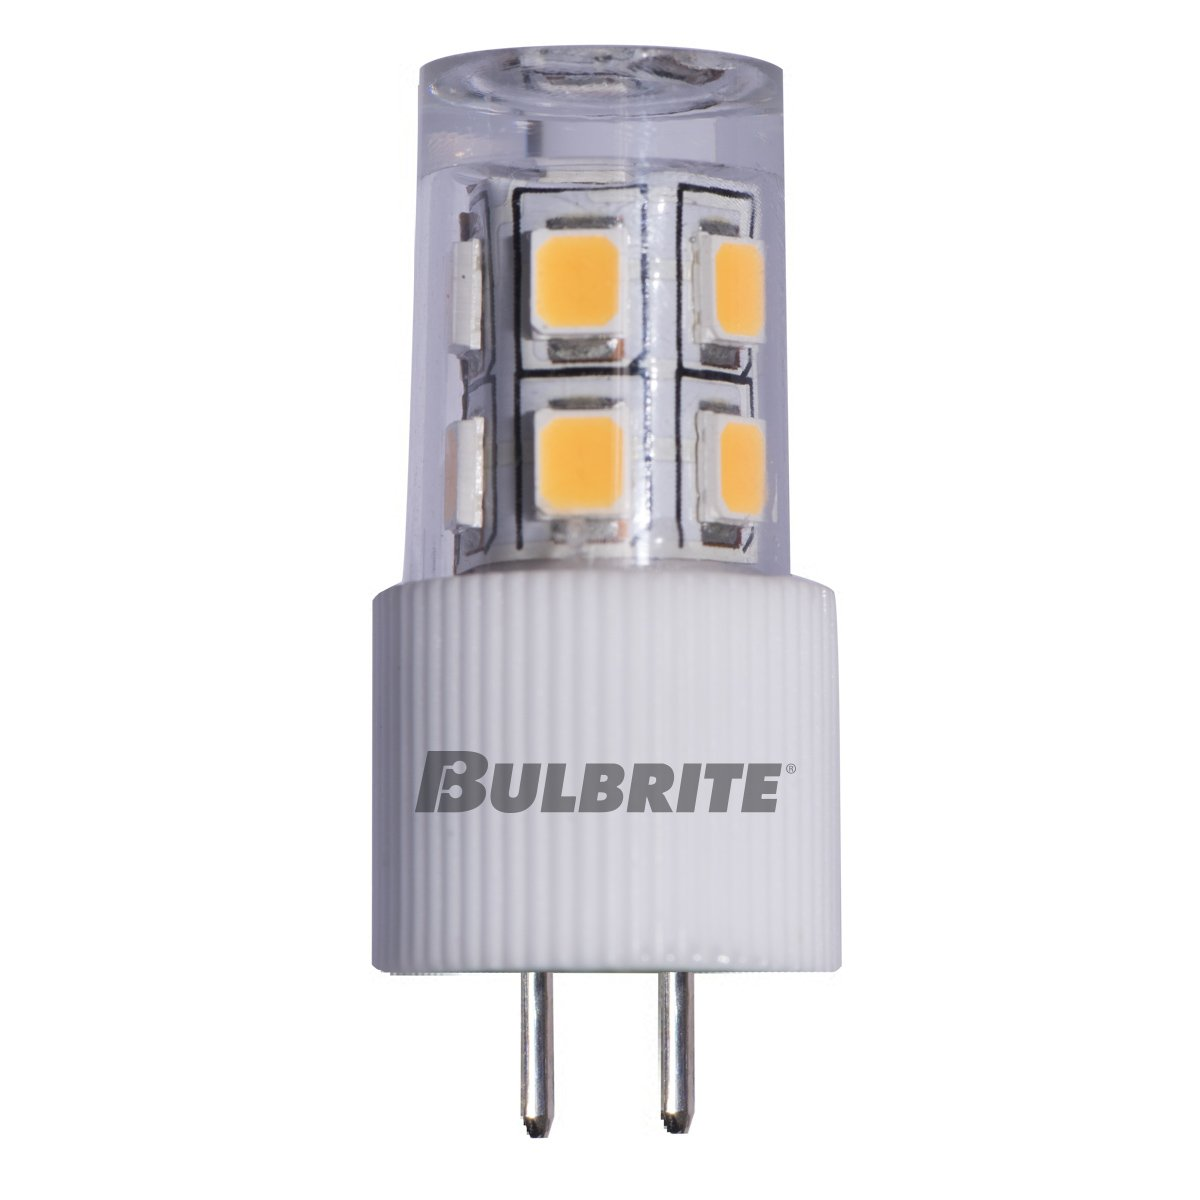 BULBRITE LED JC BI-PIN (G4) 2W Non-DIMMABLE Light Bulb 3000K/SOFT White 15 Incandescent Equivalent (Pack of 2)